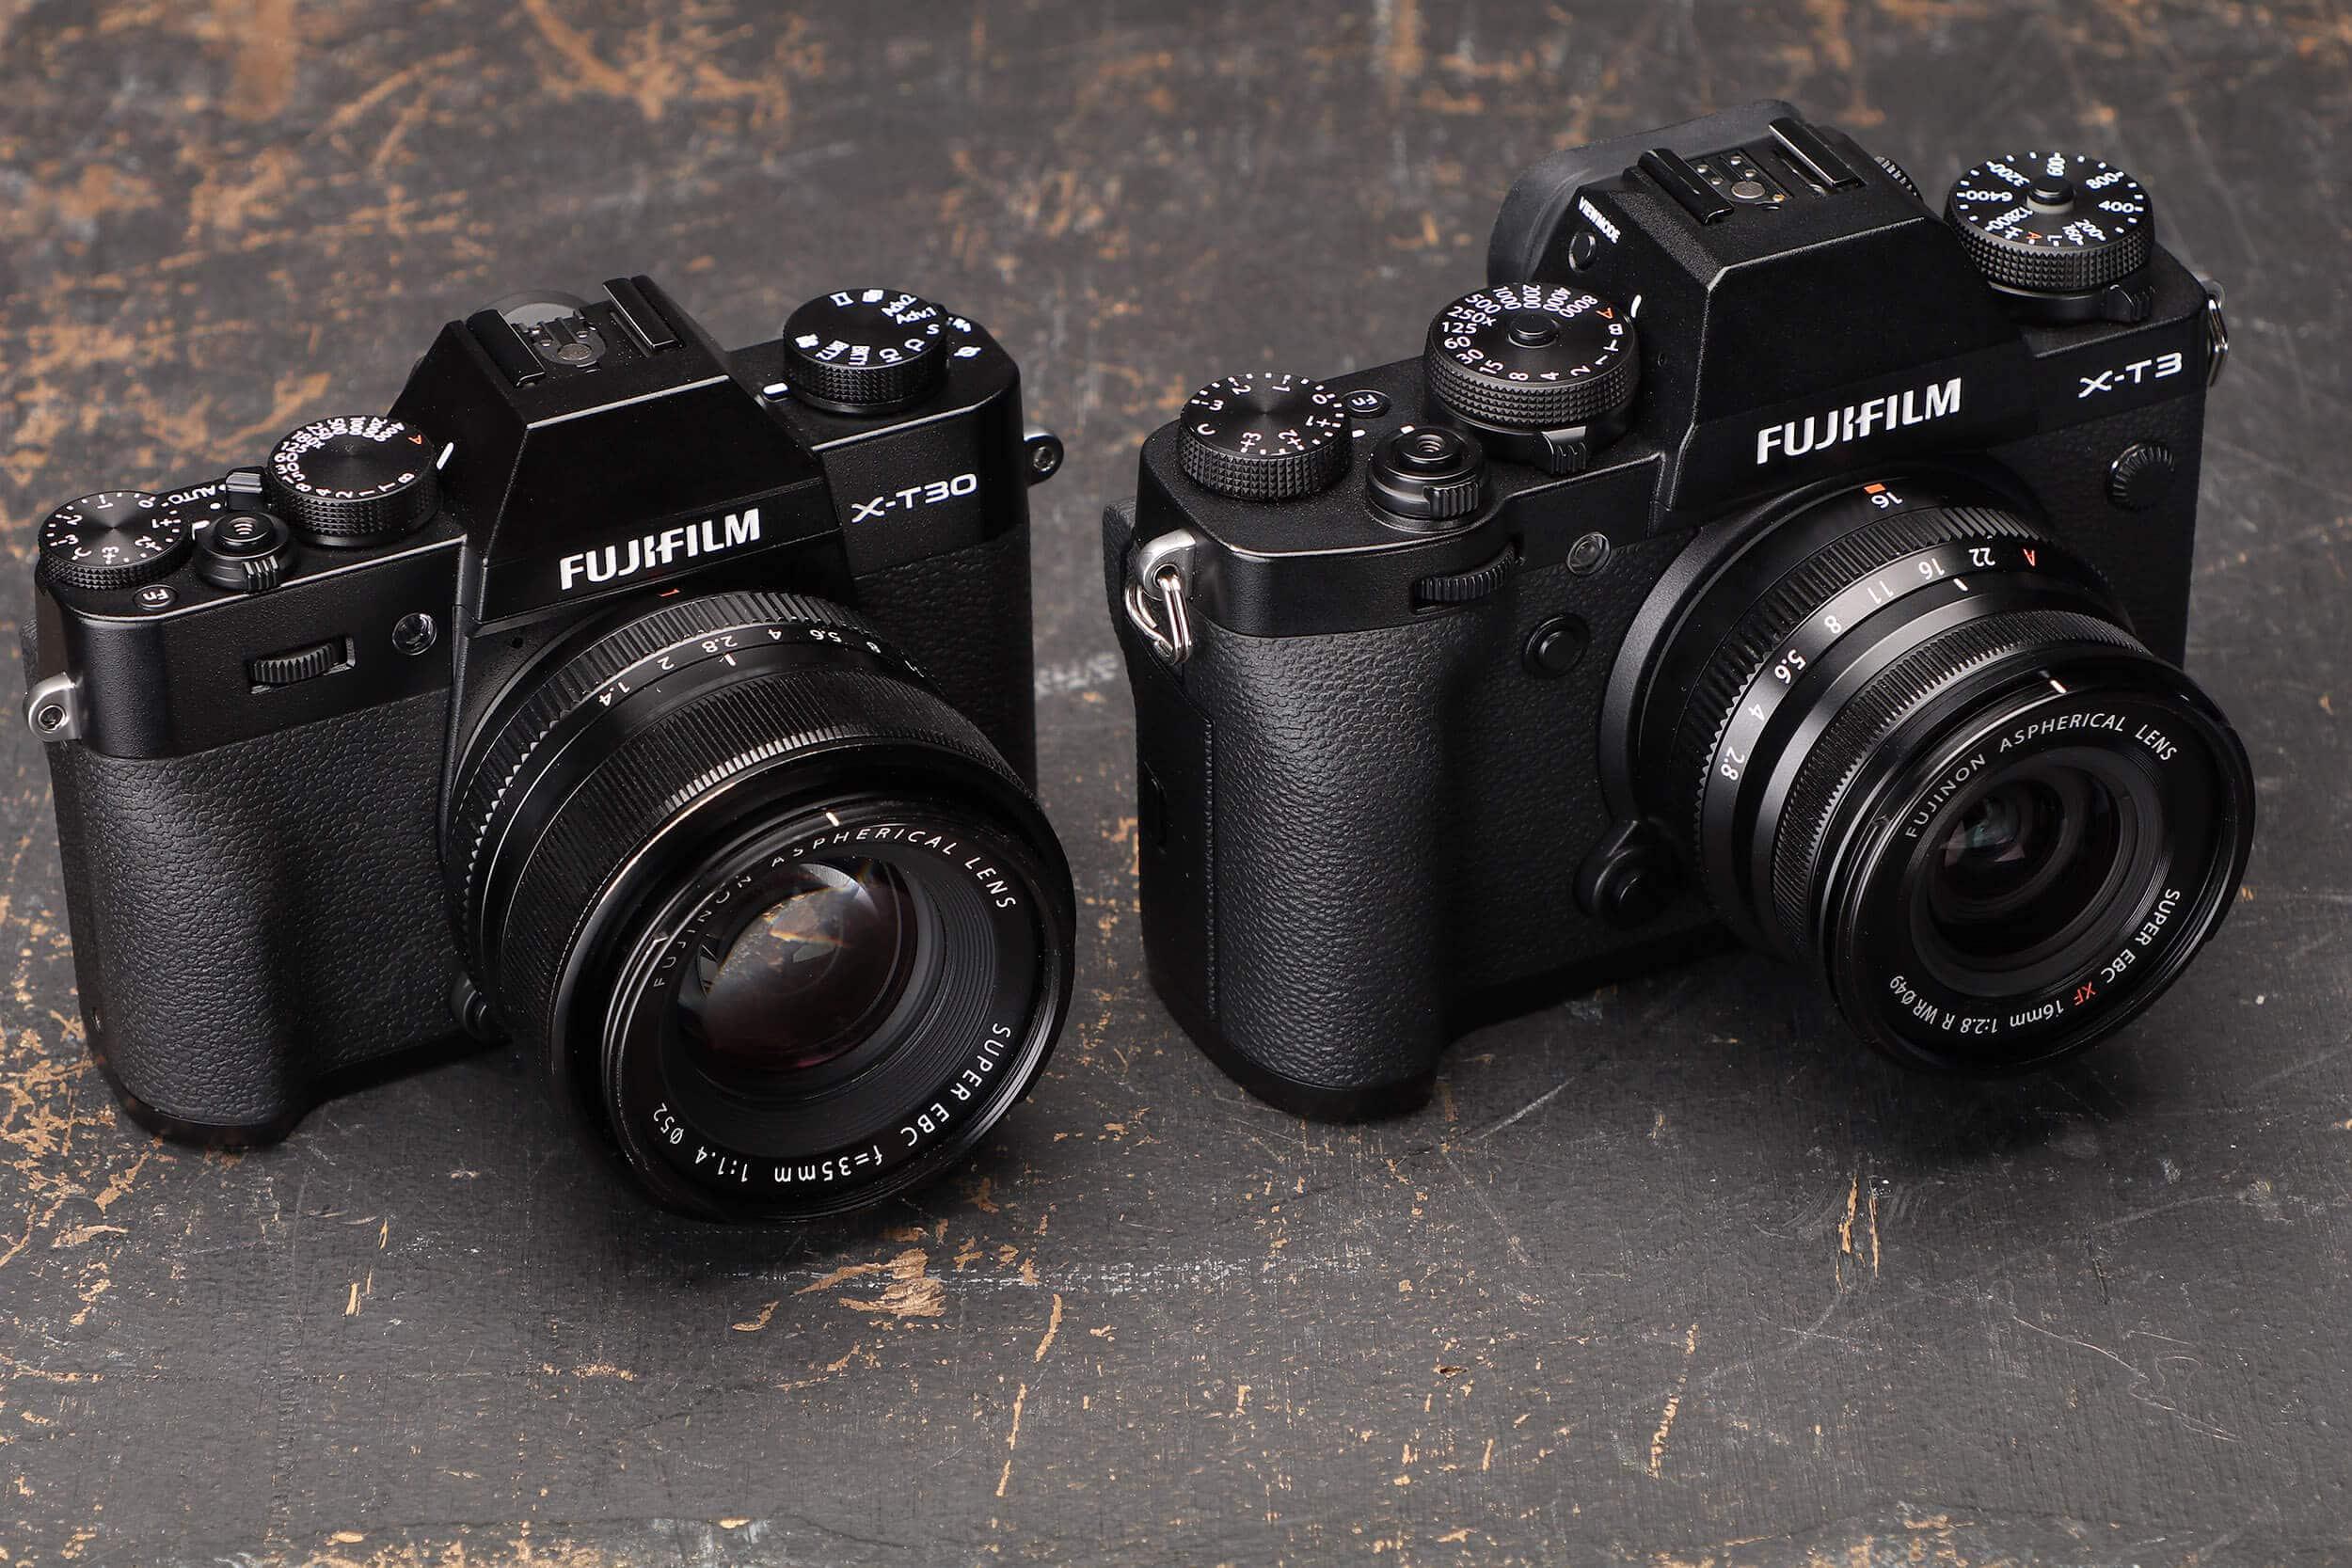 Comparação: FujiFilm X-T3 vs FujiFilm X-T30